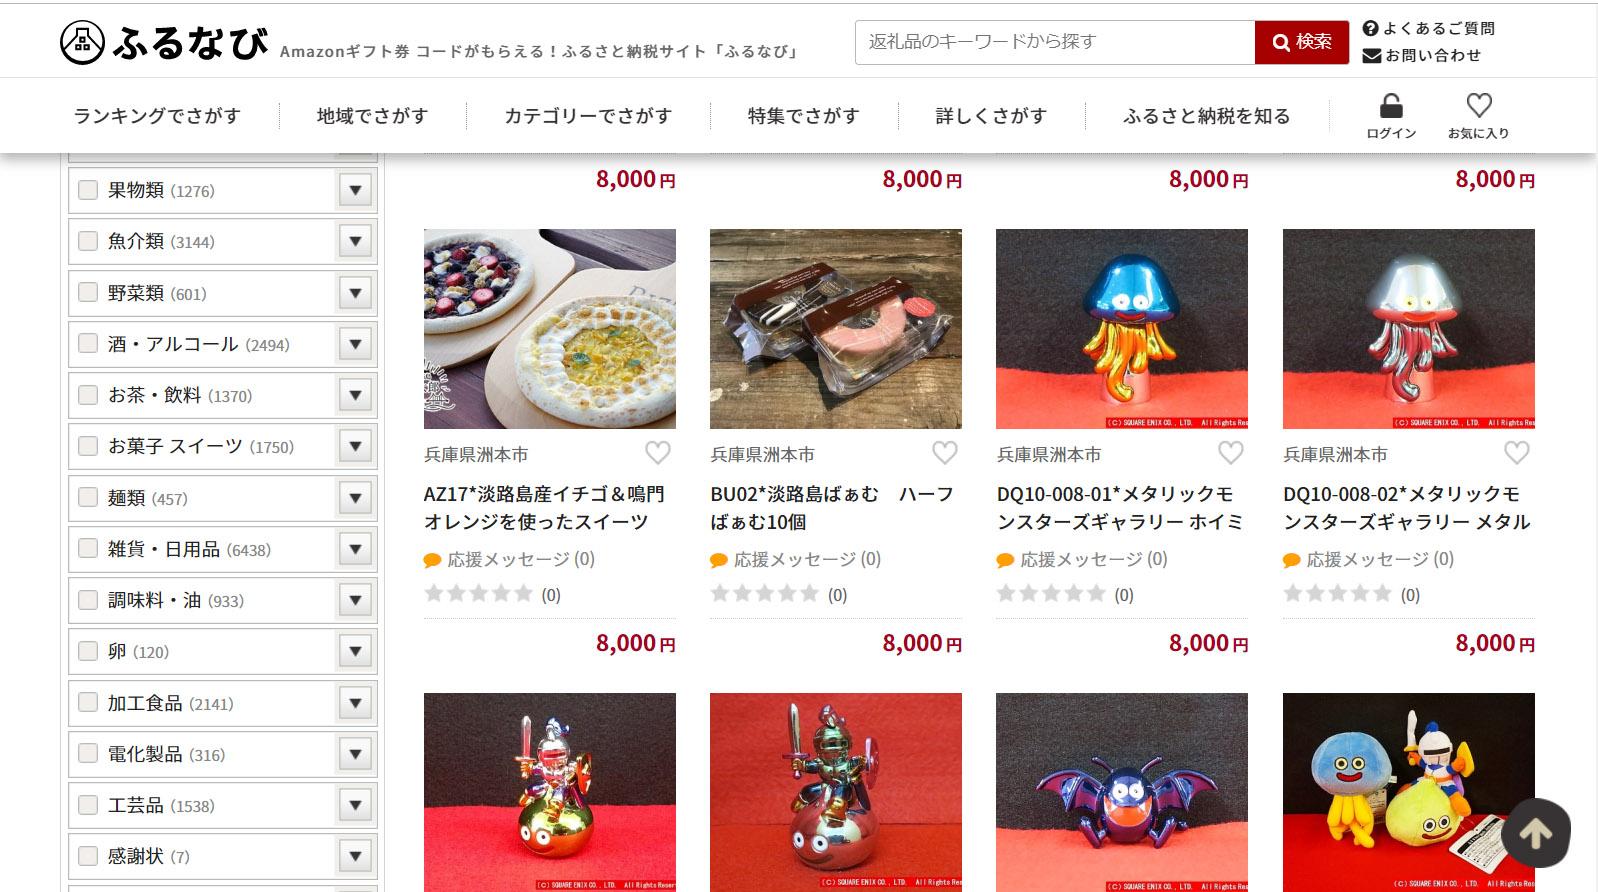 https://furunavi.jp/search.aspx?keyword=%E6%B4%B2%E6%9C%AC#keyword=%E6%B4%B2%E6%9C%AC&pageno=2&pagesize=20&order=1&search=0&layout_toggle=1